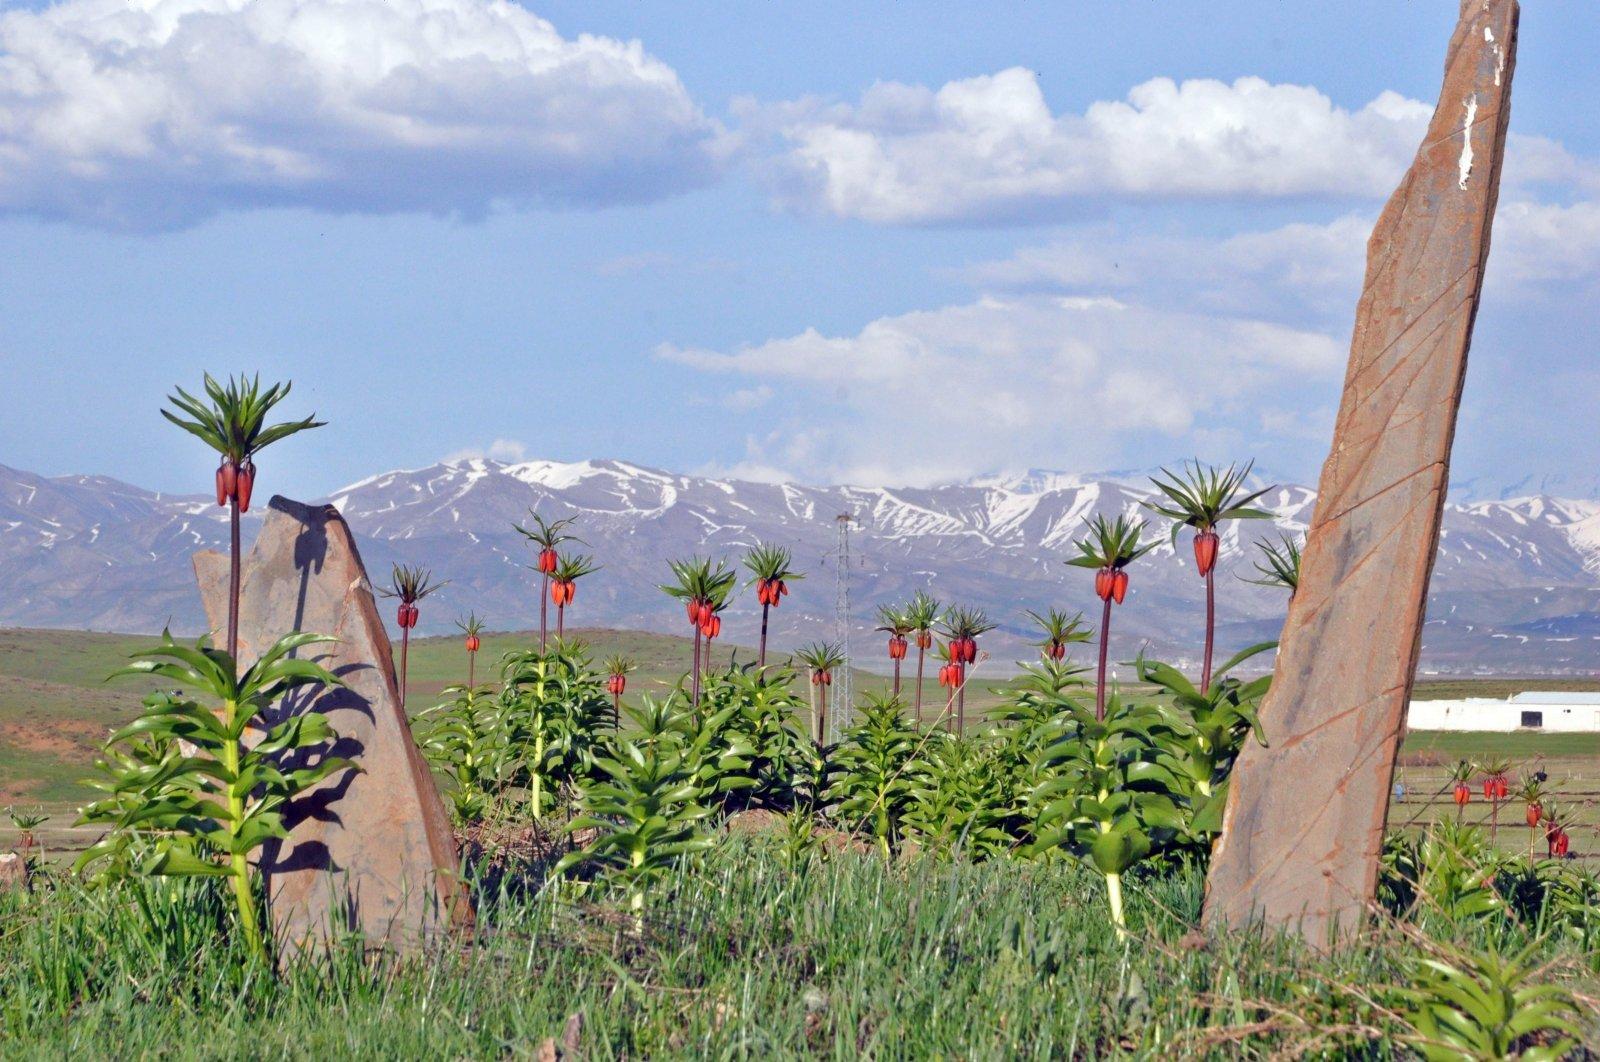 Reverse tulips have already bloomed in the plains of Yüksekova in Hakkari. (IHA Photo)